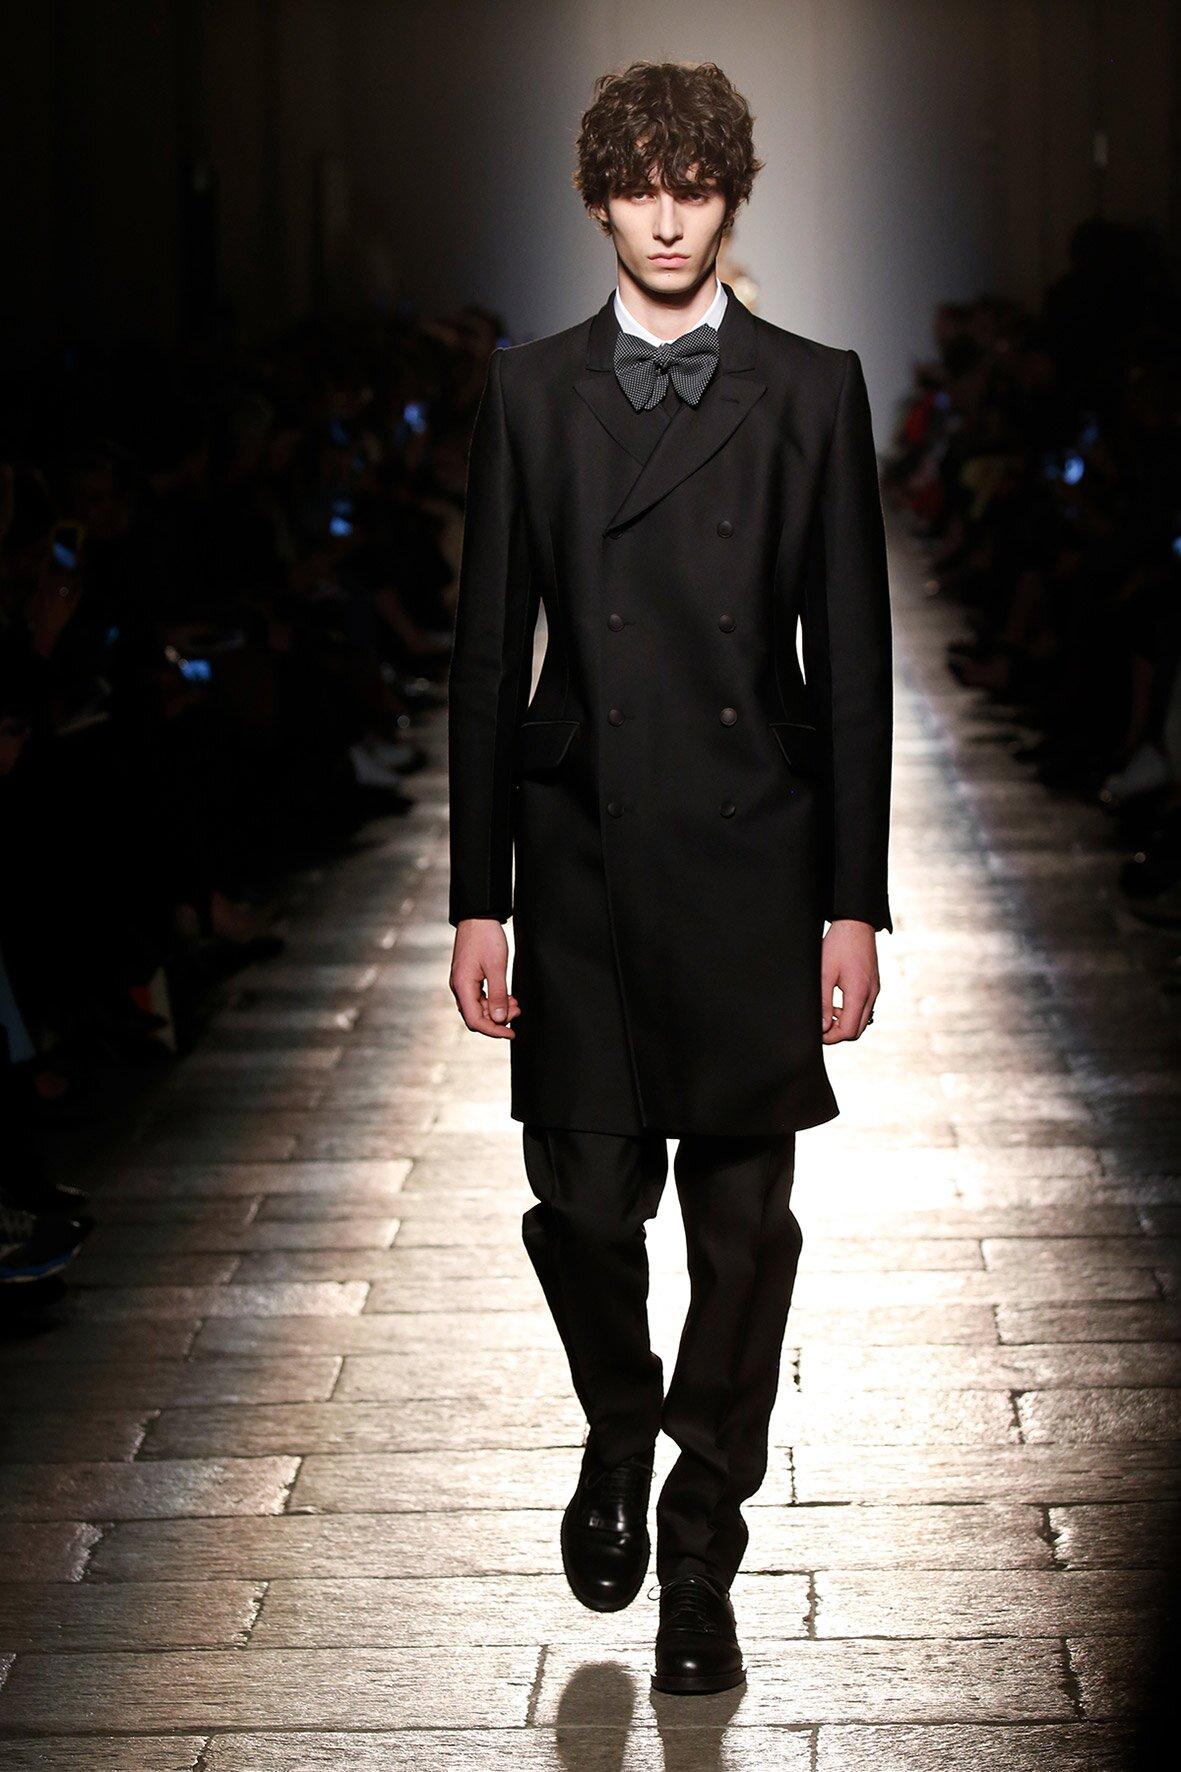 Fashion Man Model Bottega Veneta Runway